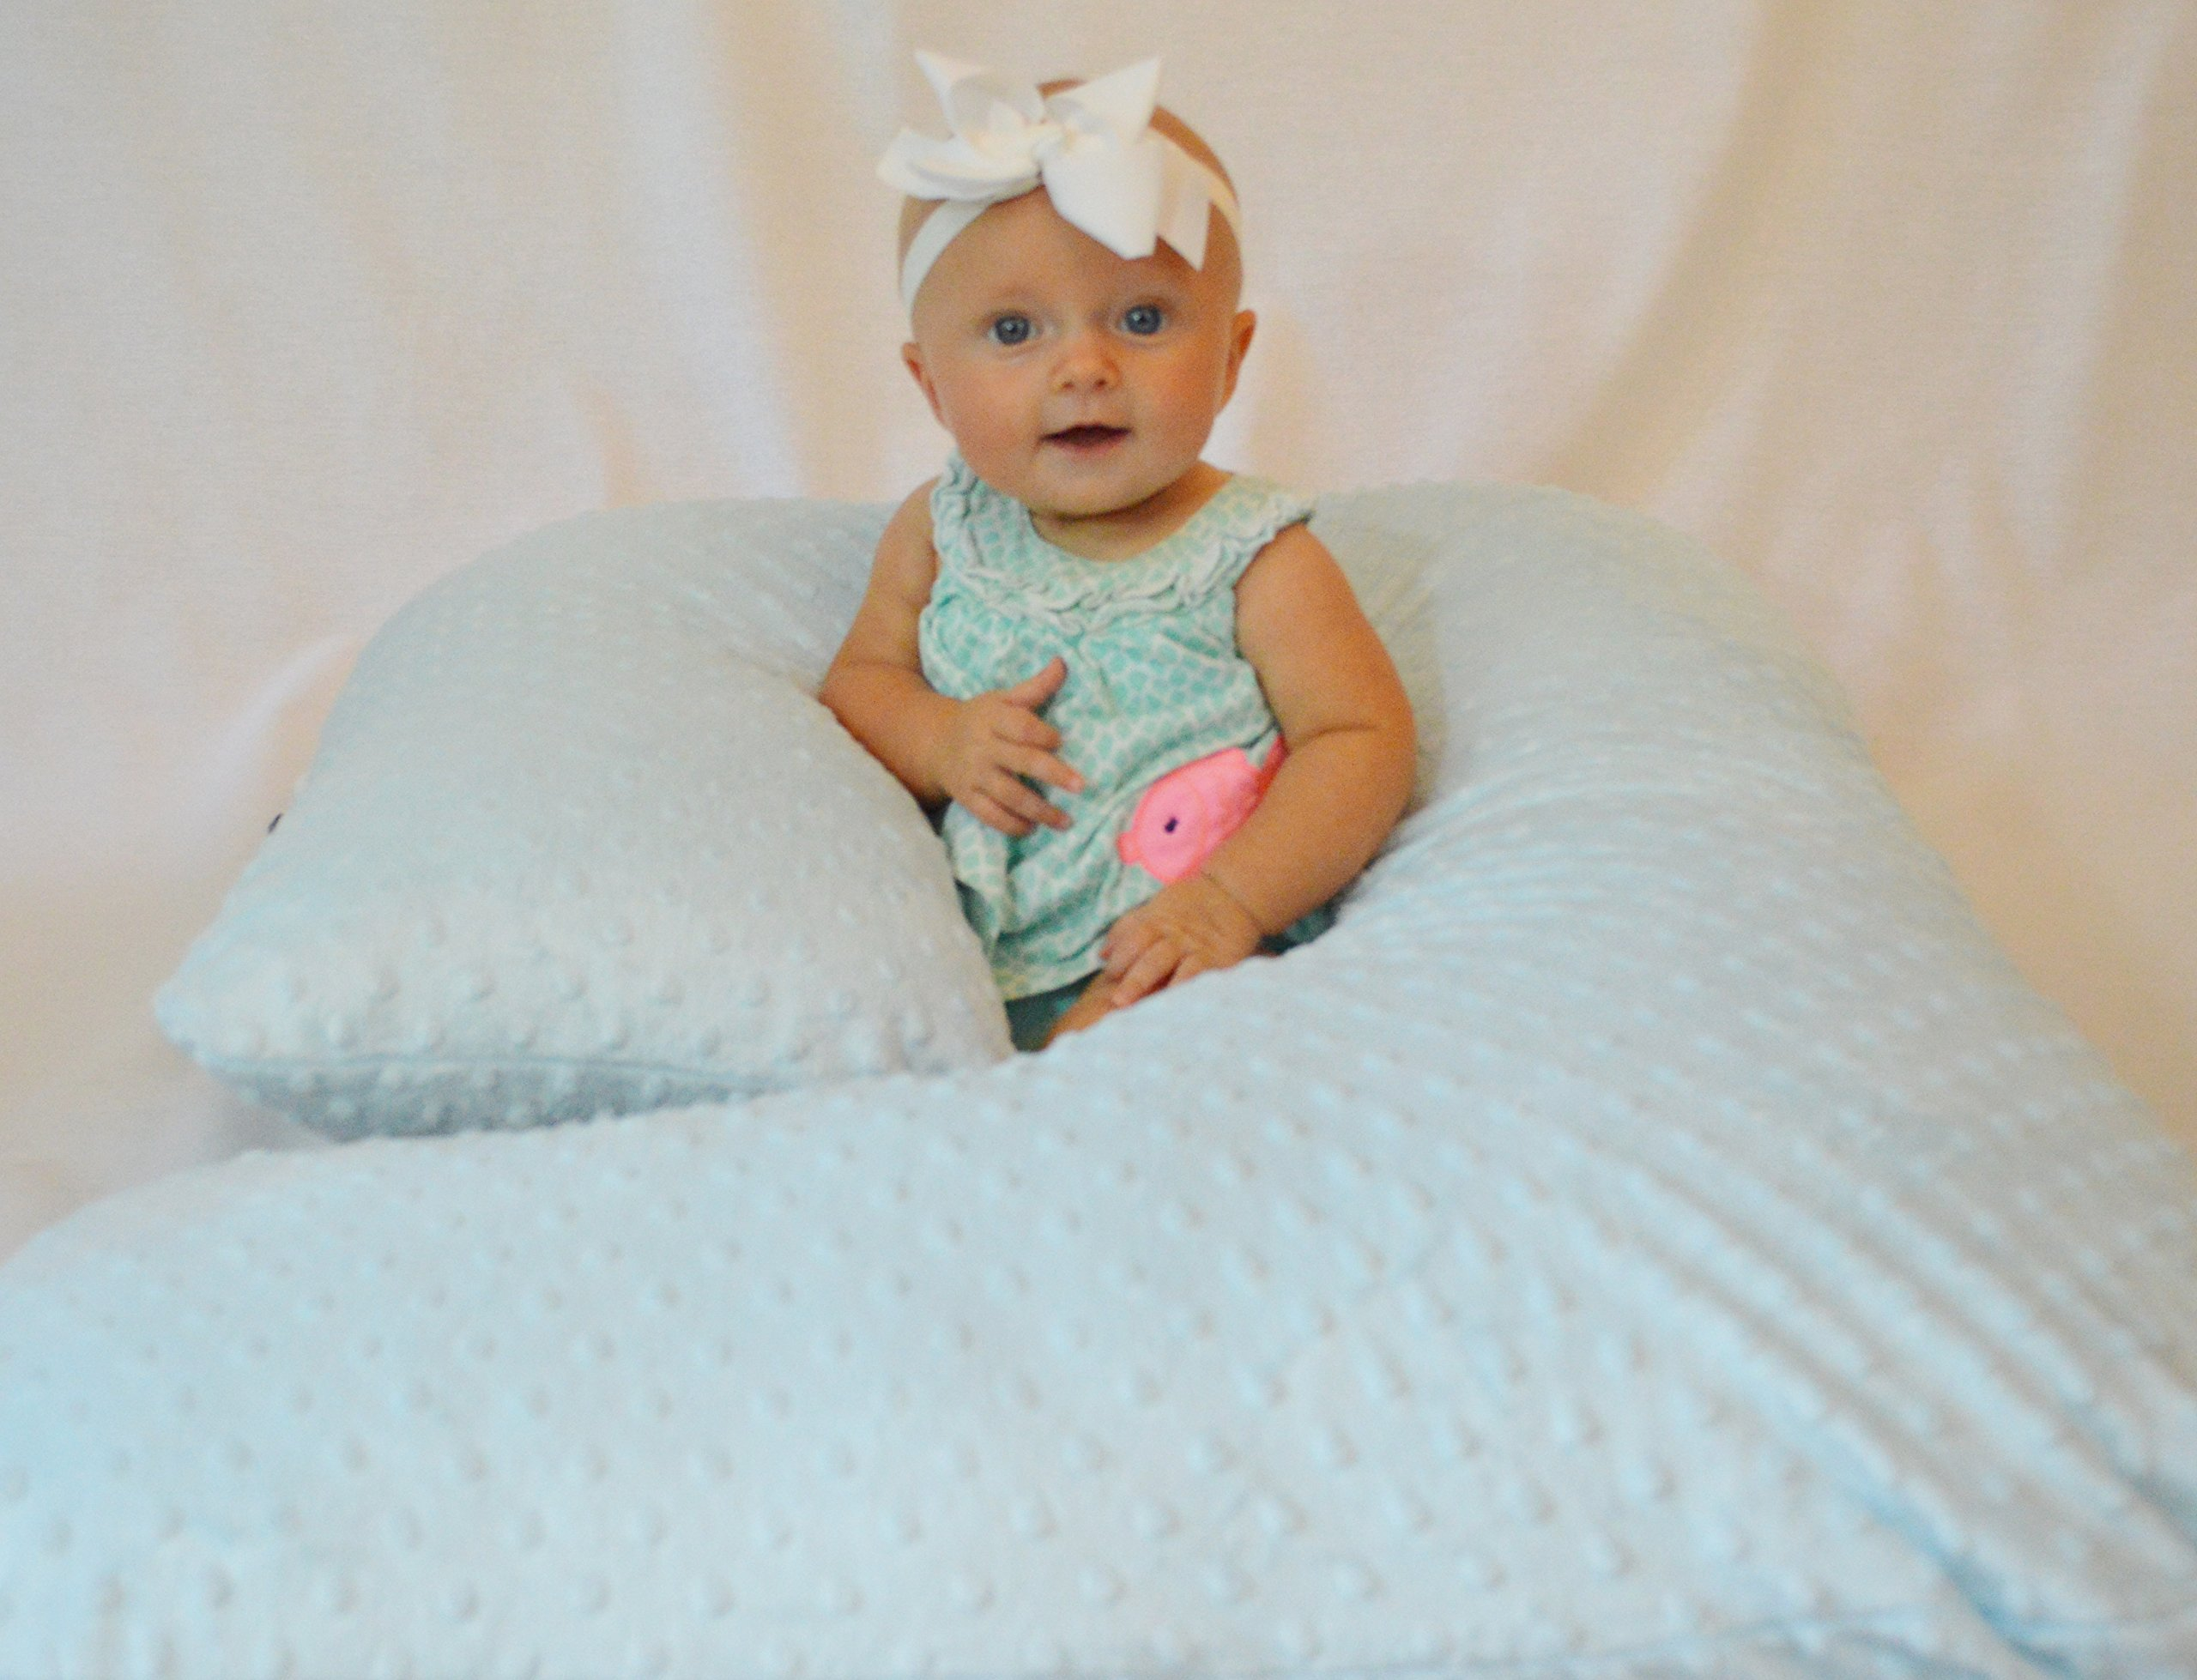 The One Z Nursing Pillow - WATERPROOF BIRDIES